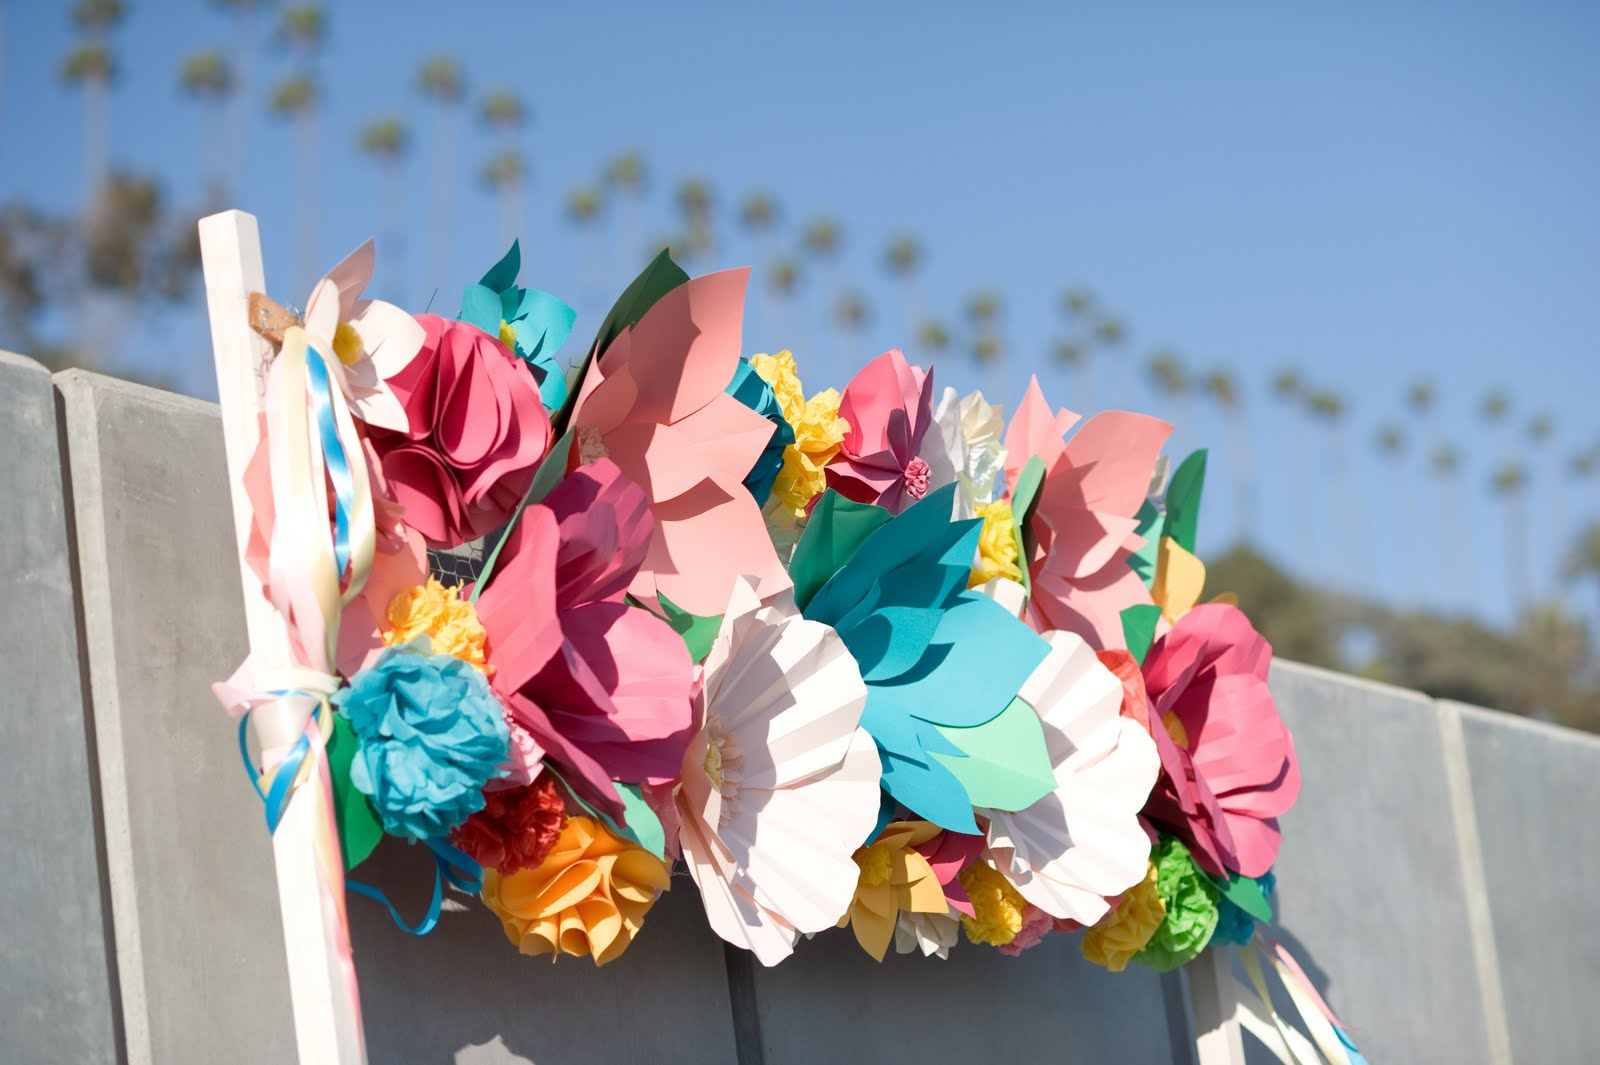 Icing Designs DIY Paper Flowers